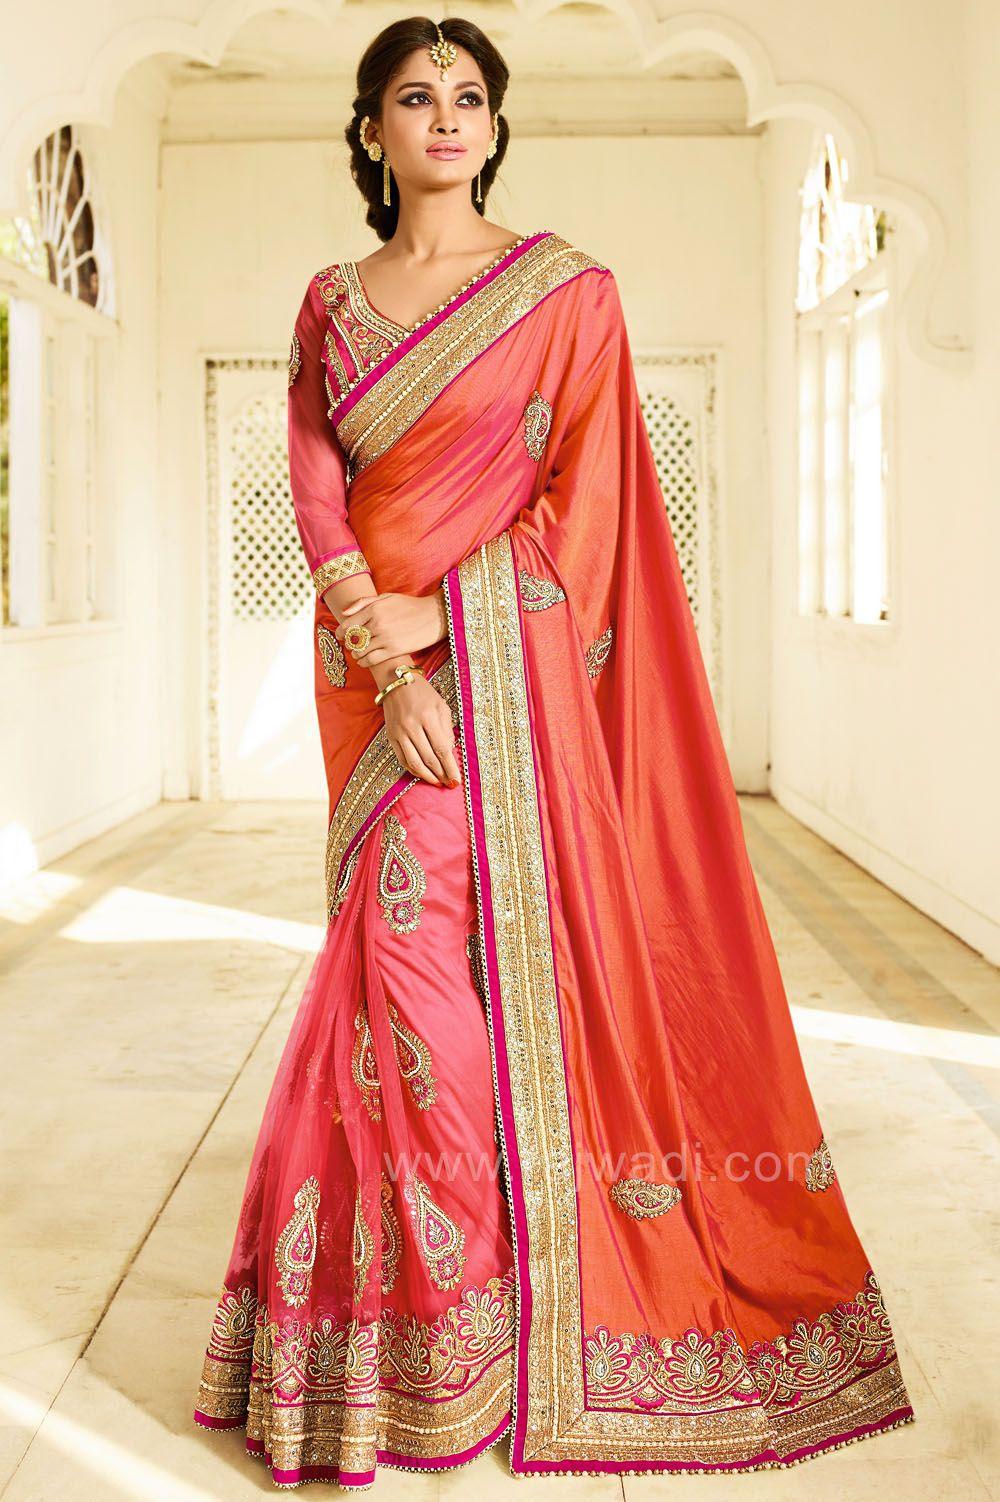 c194ed1b1b Attractive Rajwadi Saree #RoyalLook #Saree #Rani #Pink #Rust #Wedding  #Rajwadi